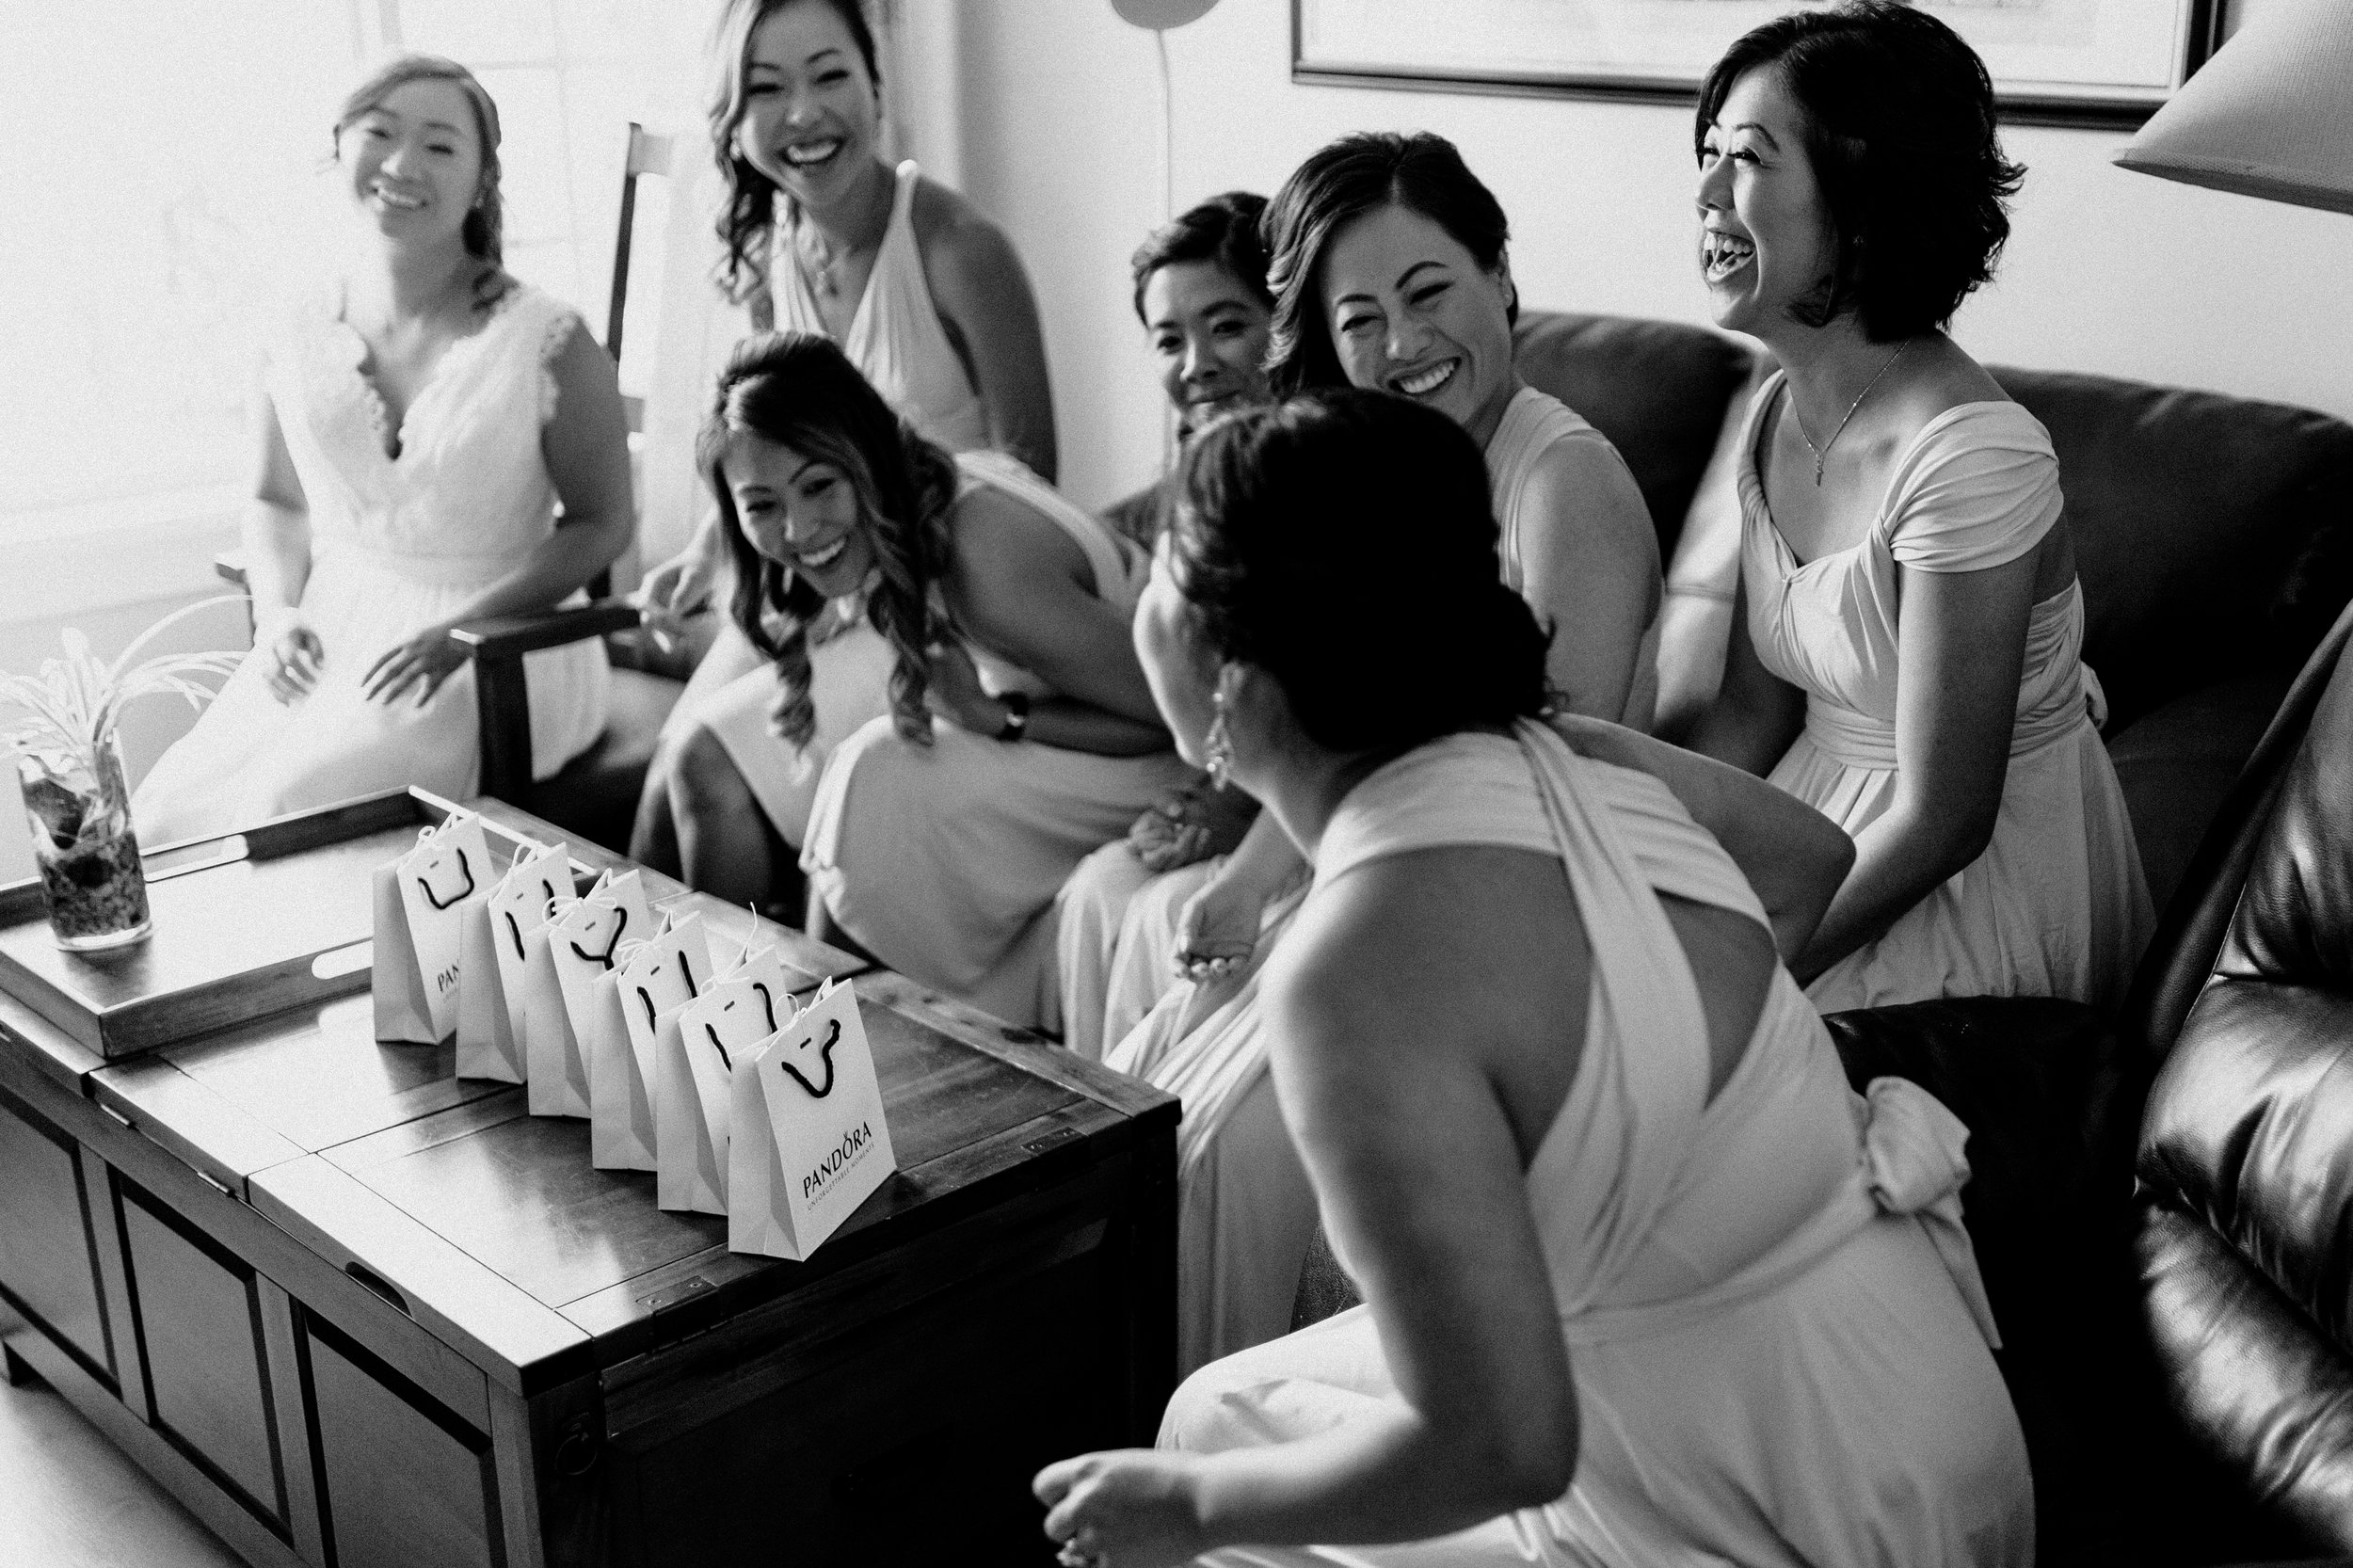 herafilms_wedding_jessica_kyle_hera_selects-6.jpg